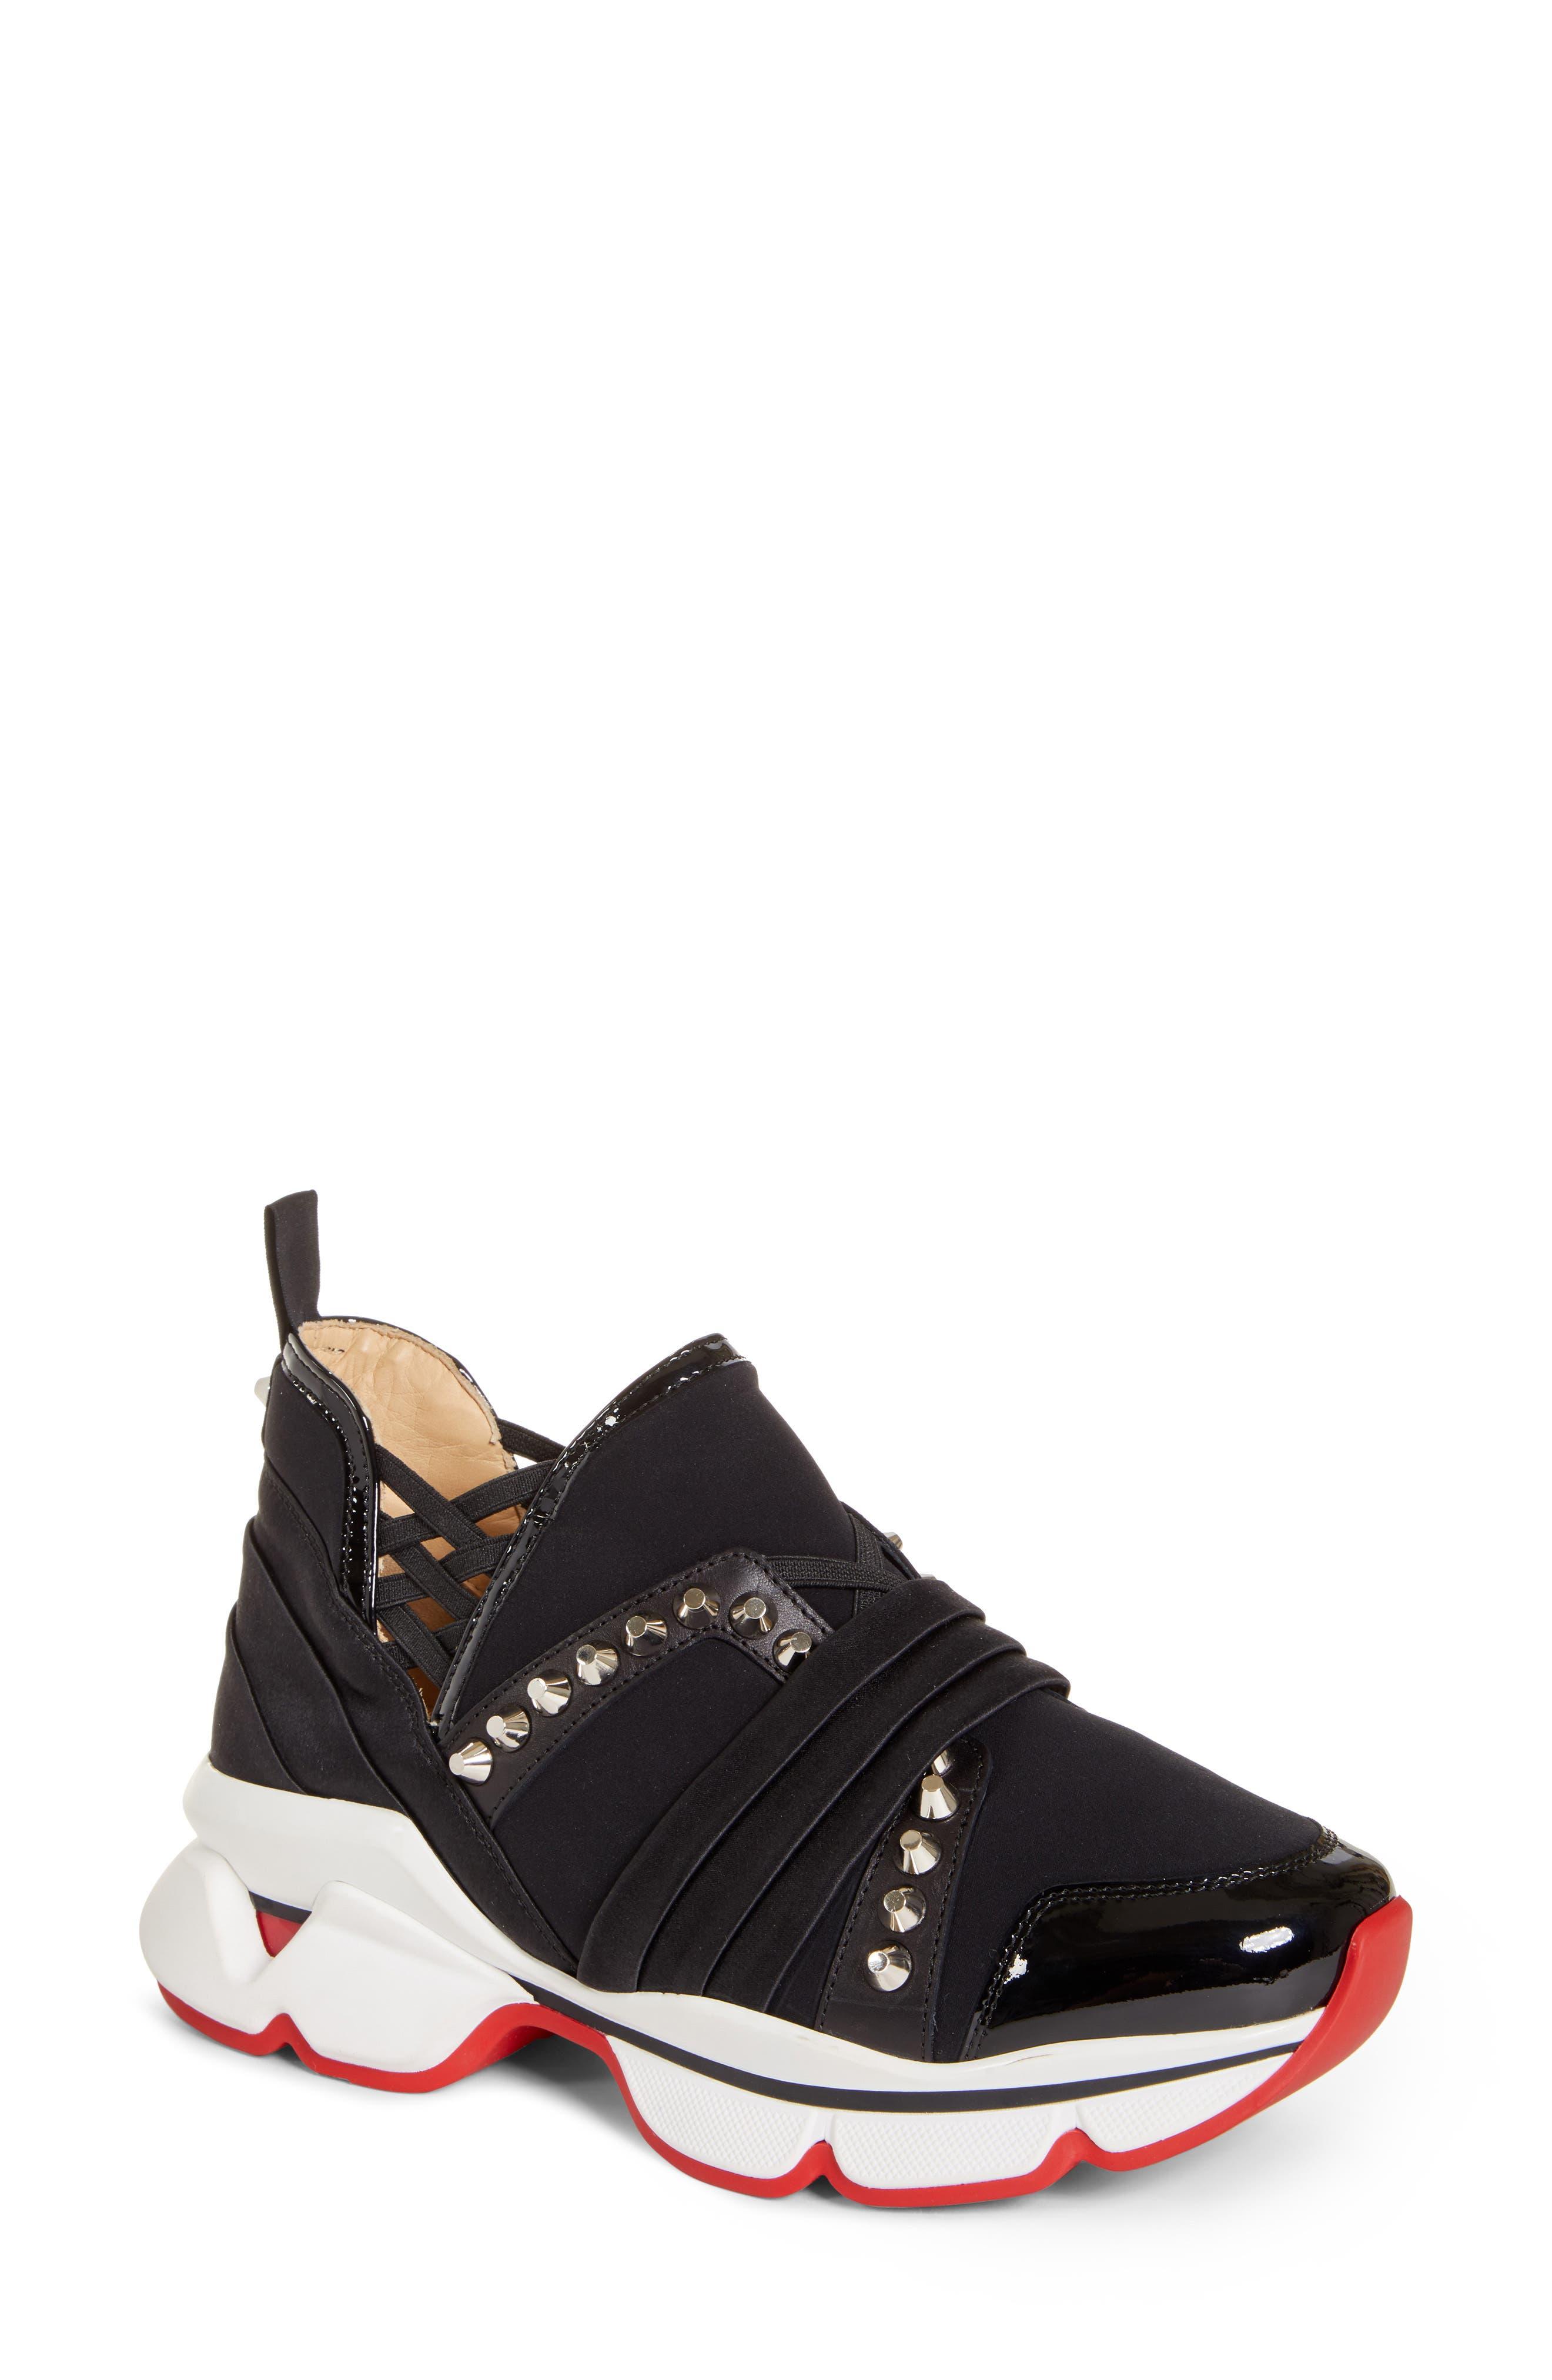 b36a1b48d682 Christian Louboutin 123 Run Flat Red Sole Sneakers In Black